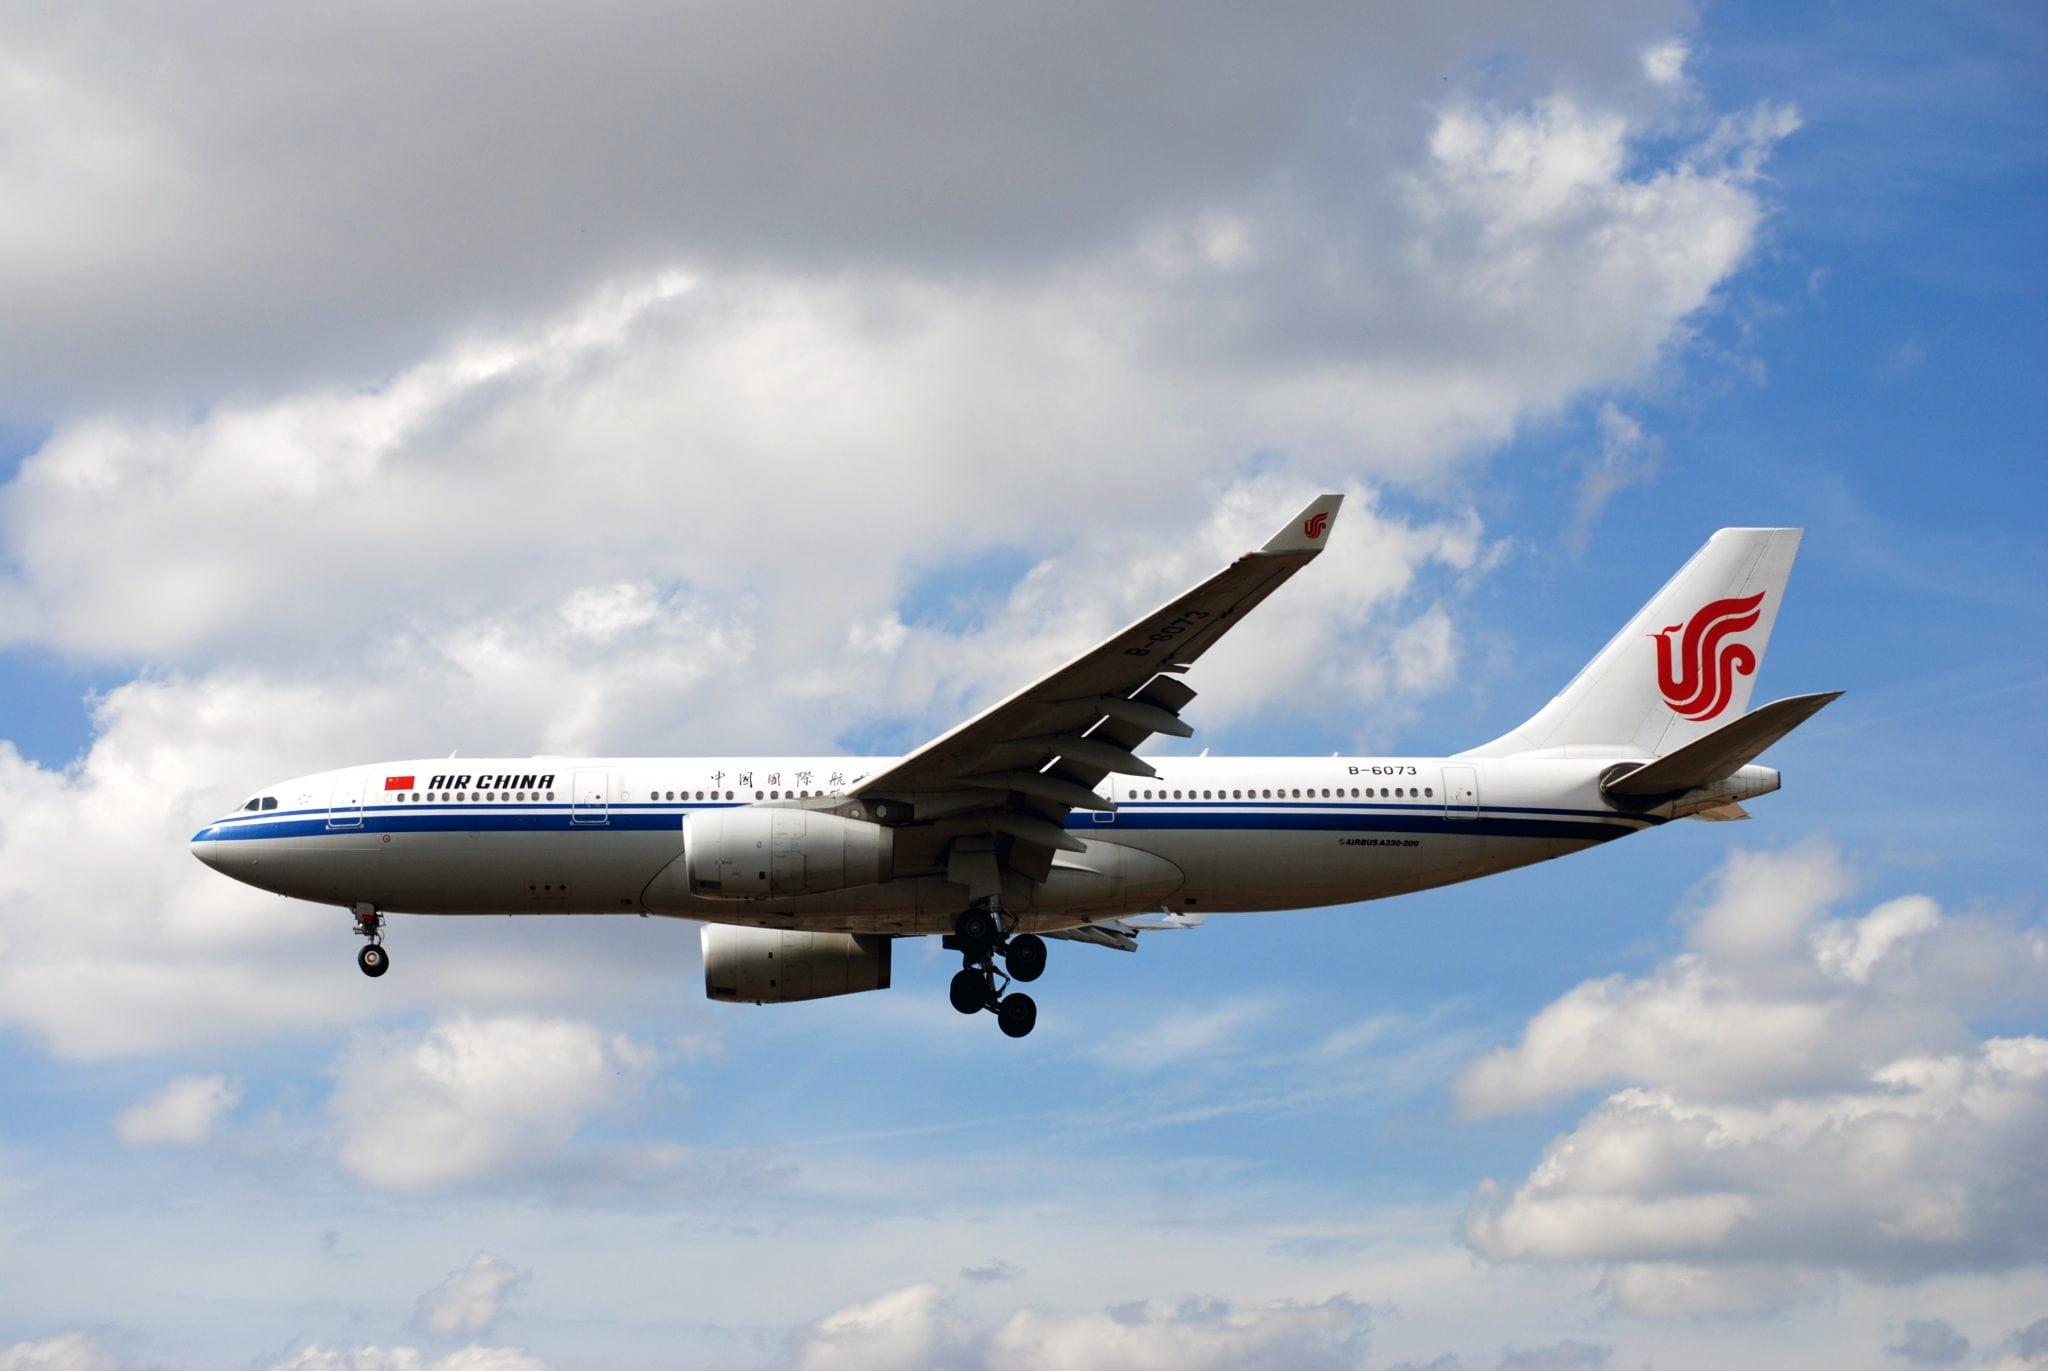 An Air China flight